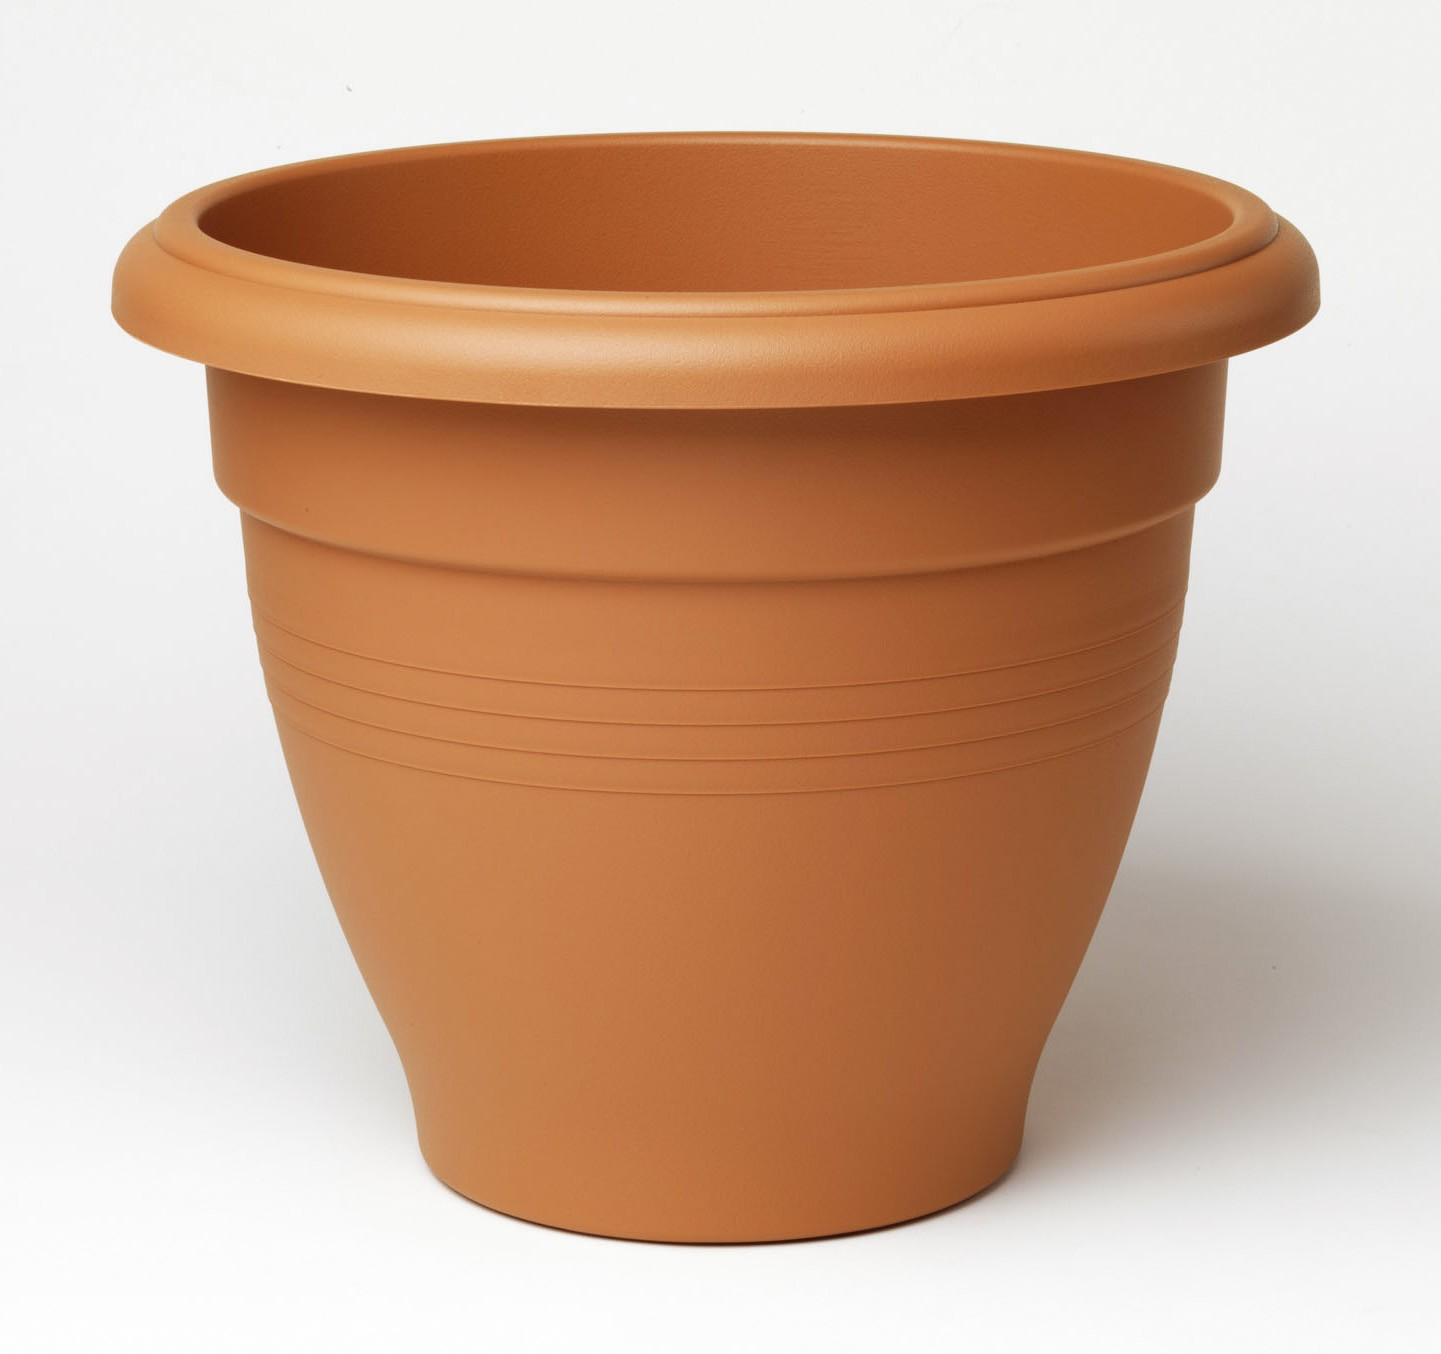 palladian planter terracotta smith 39 s orchard garden centre. Black Bedroom Furniture Sets. Home Design Ideas